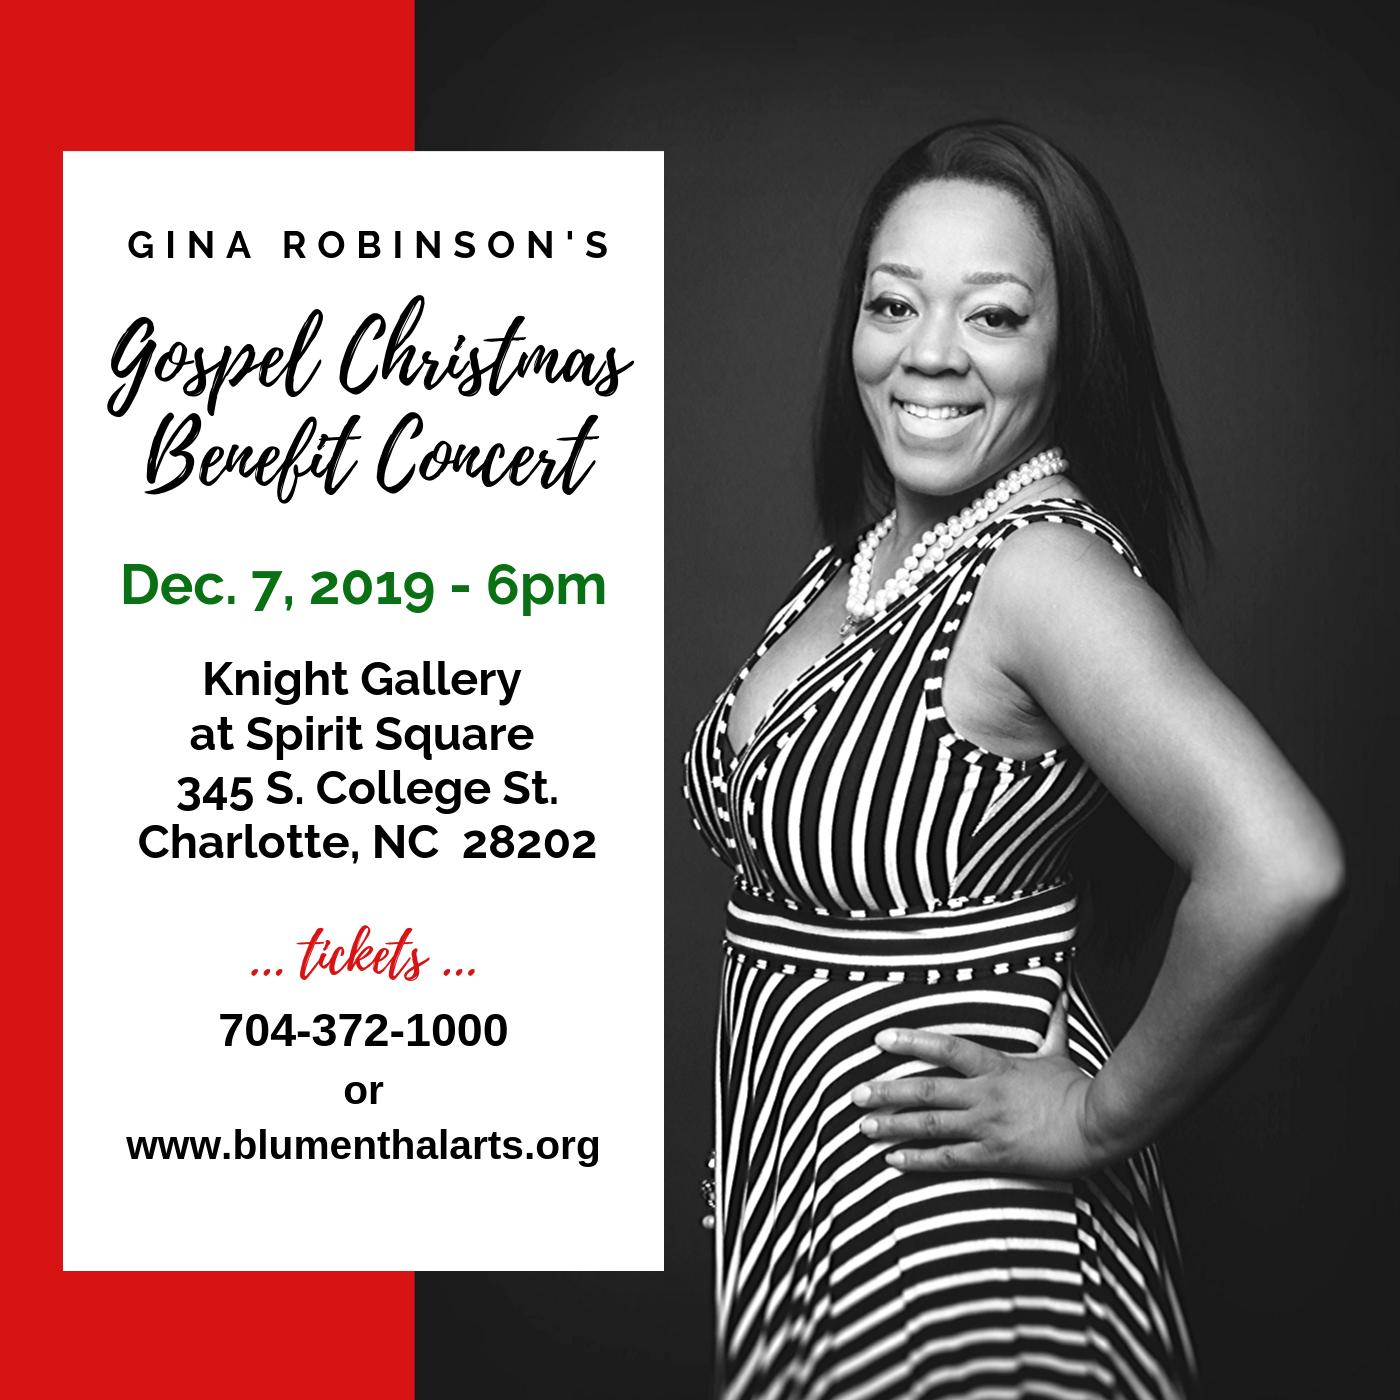 Gina Robinson's Gospel Christmas Benefit Concert